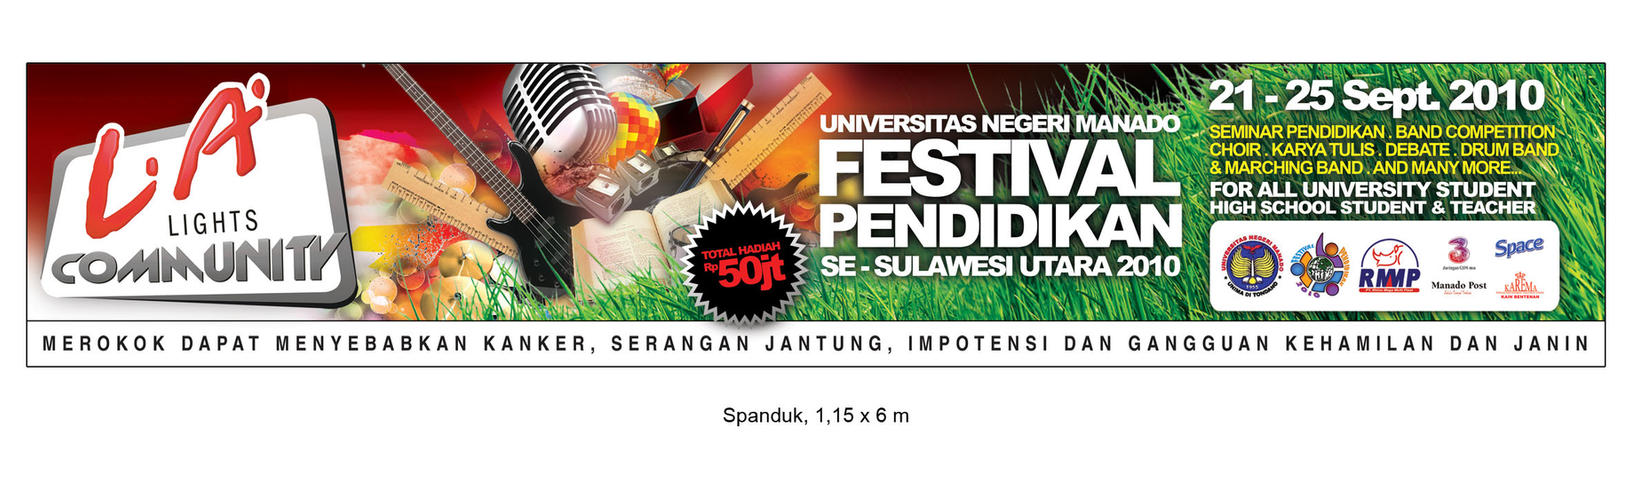 Festival Pendidikan II by Janitra